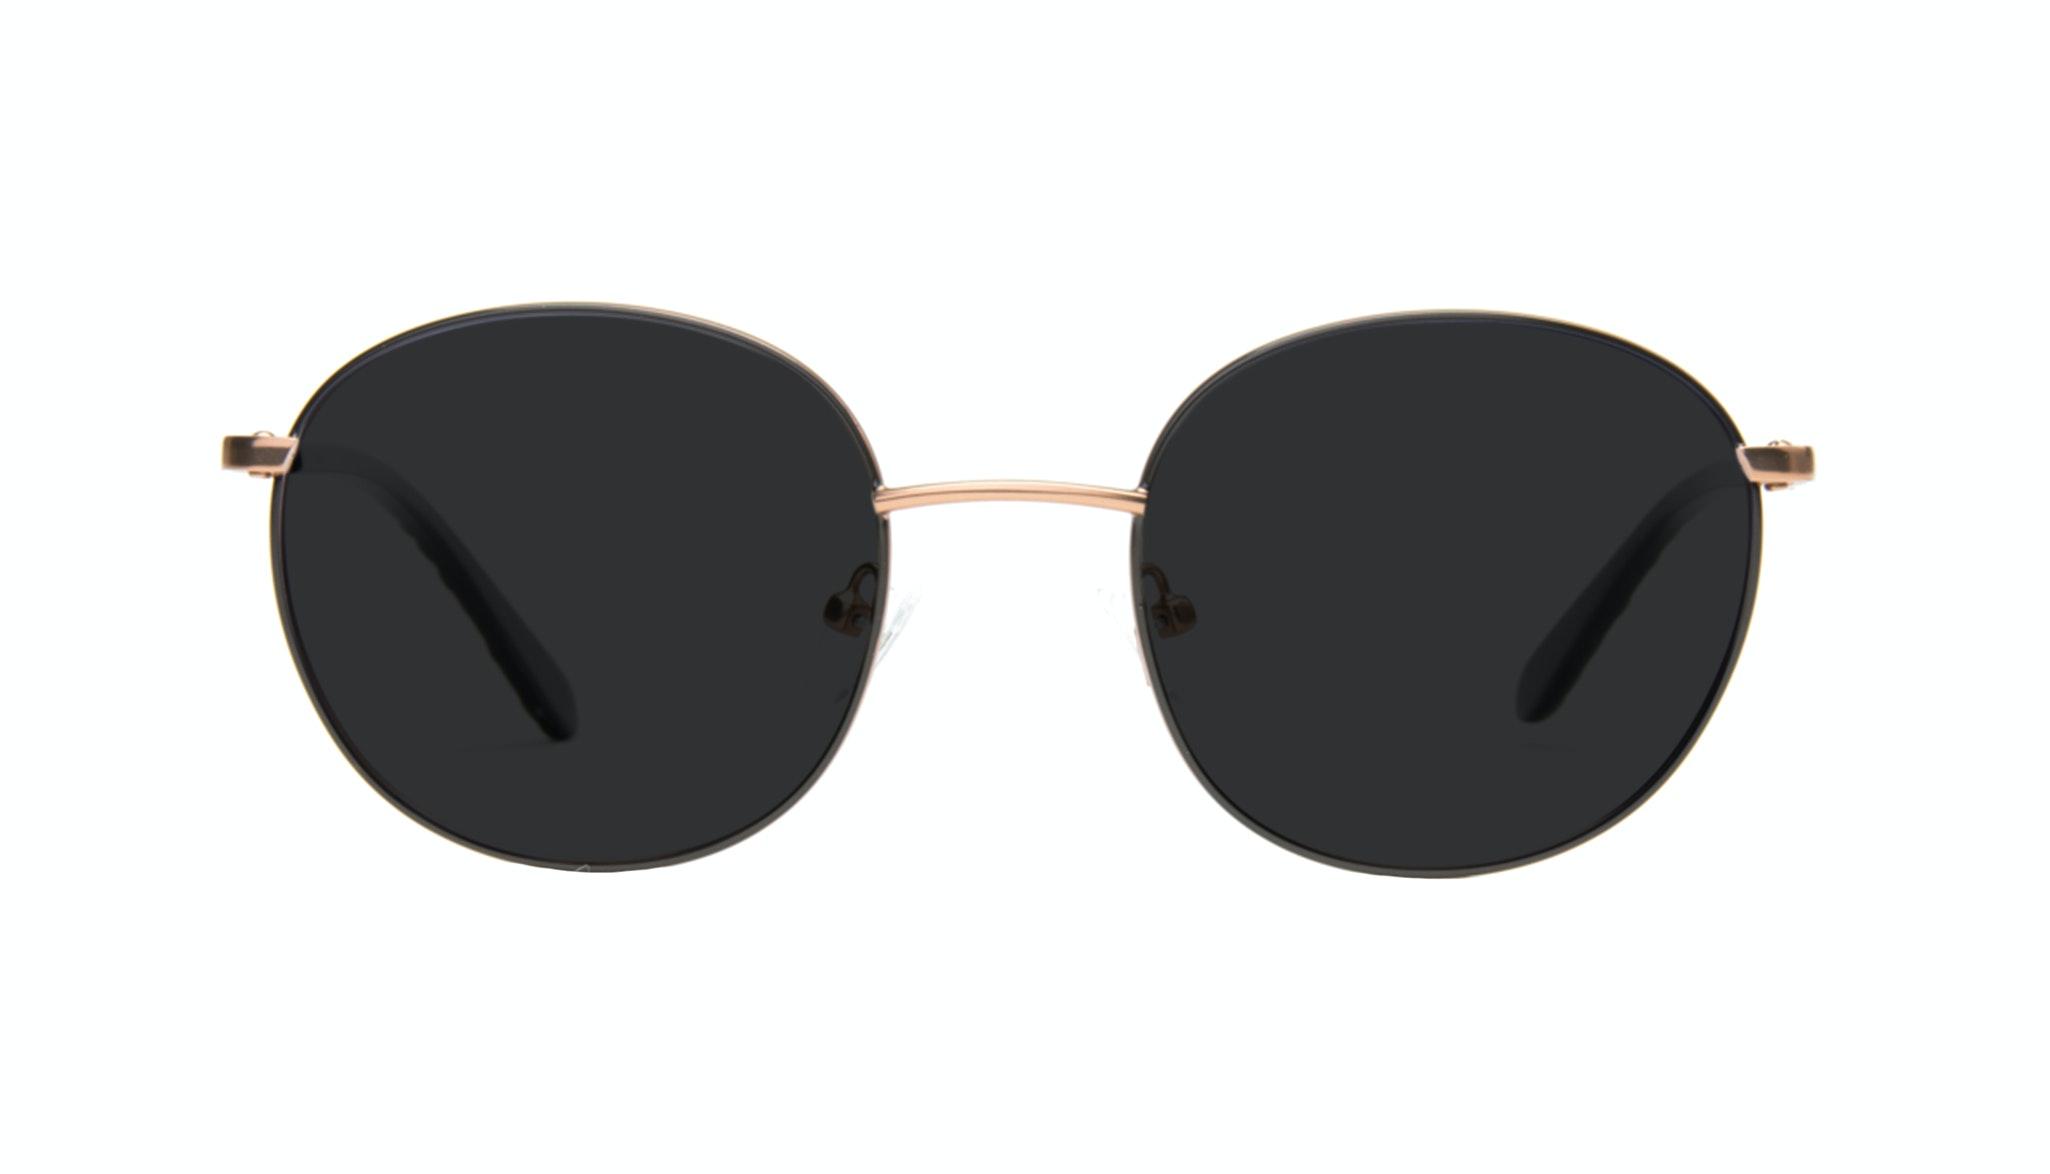 Affordable Fashion Glasses Round Sunglasses Women Joy Black Copper